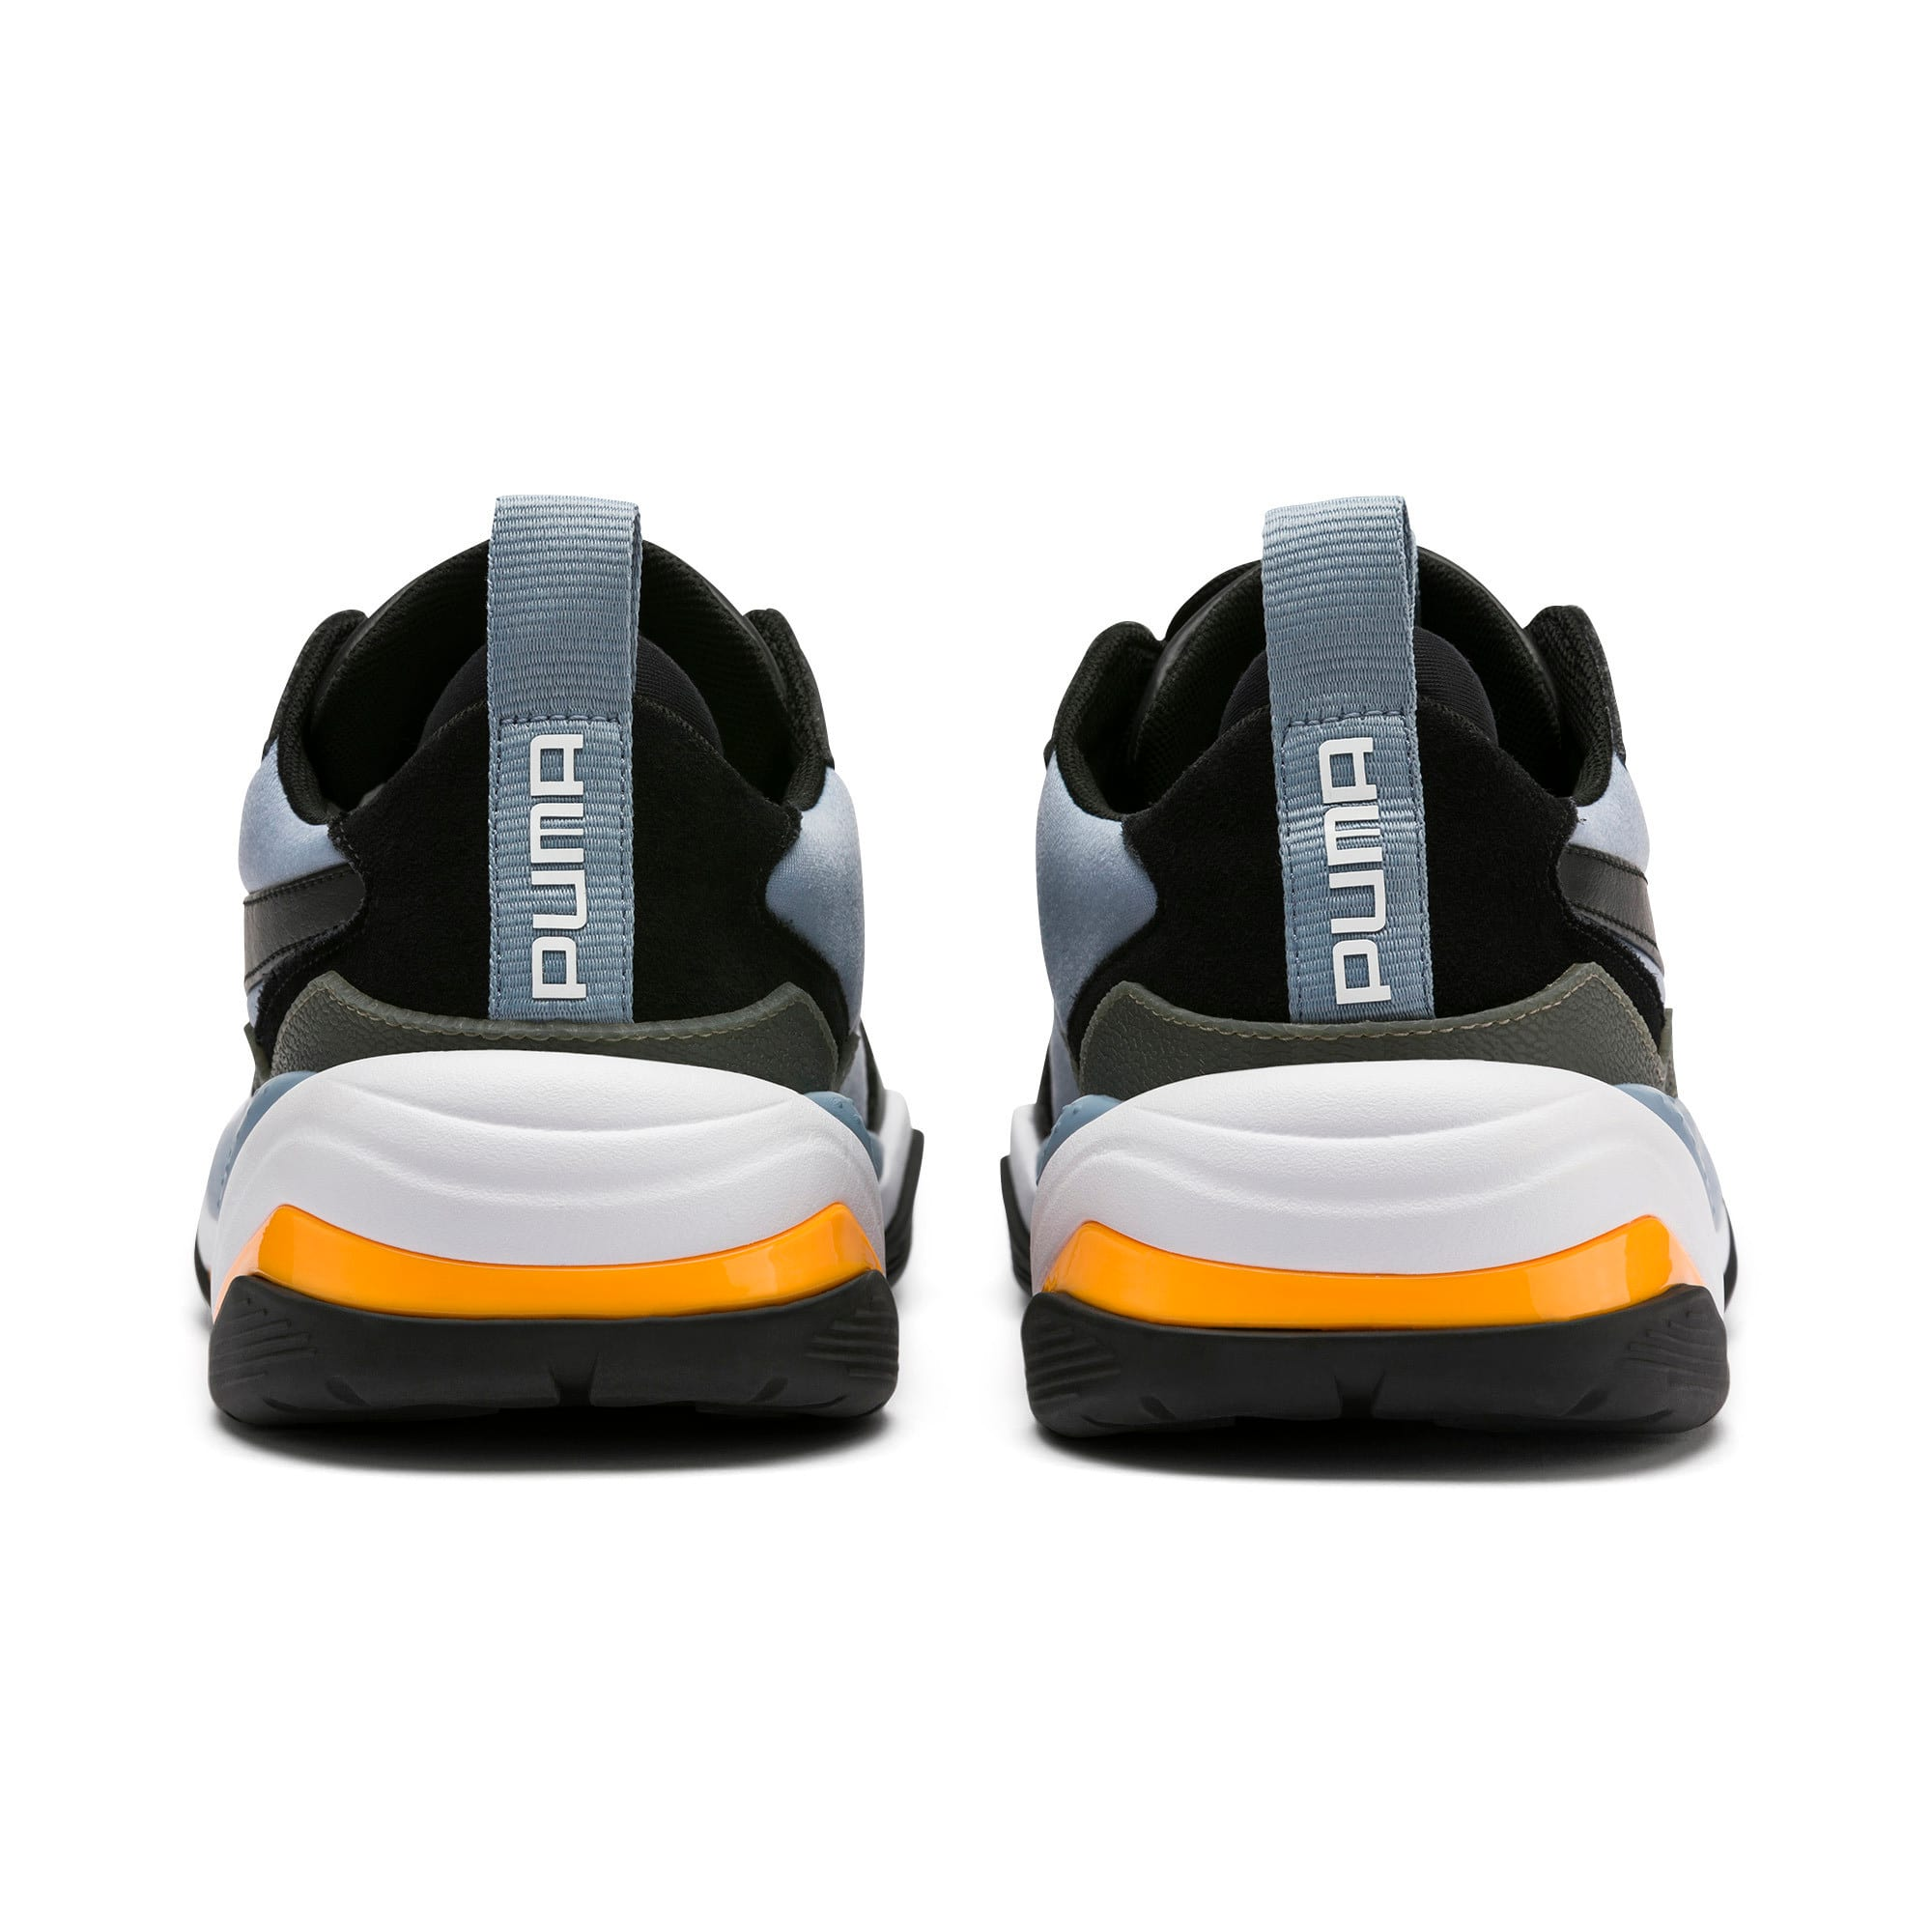 Thumbnail 4 of Thunder Fashion 2.0 sportschoenen, P Black-Faded Denim-P White, medium